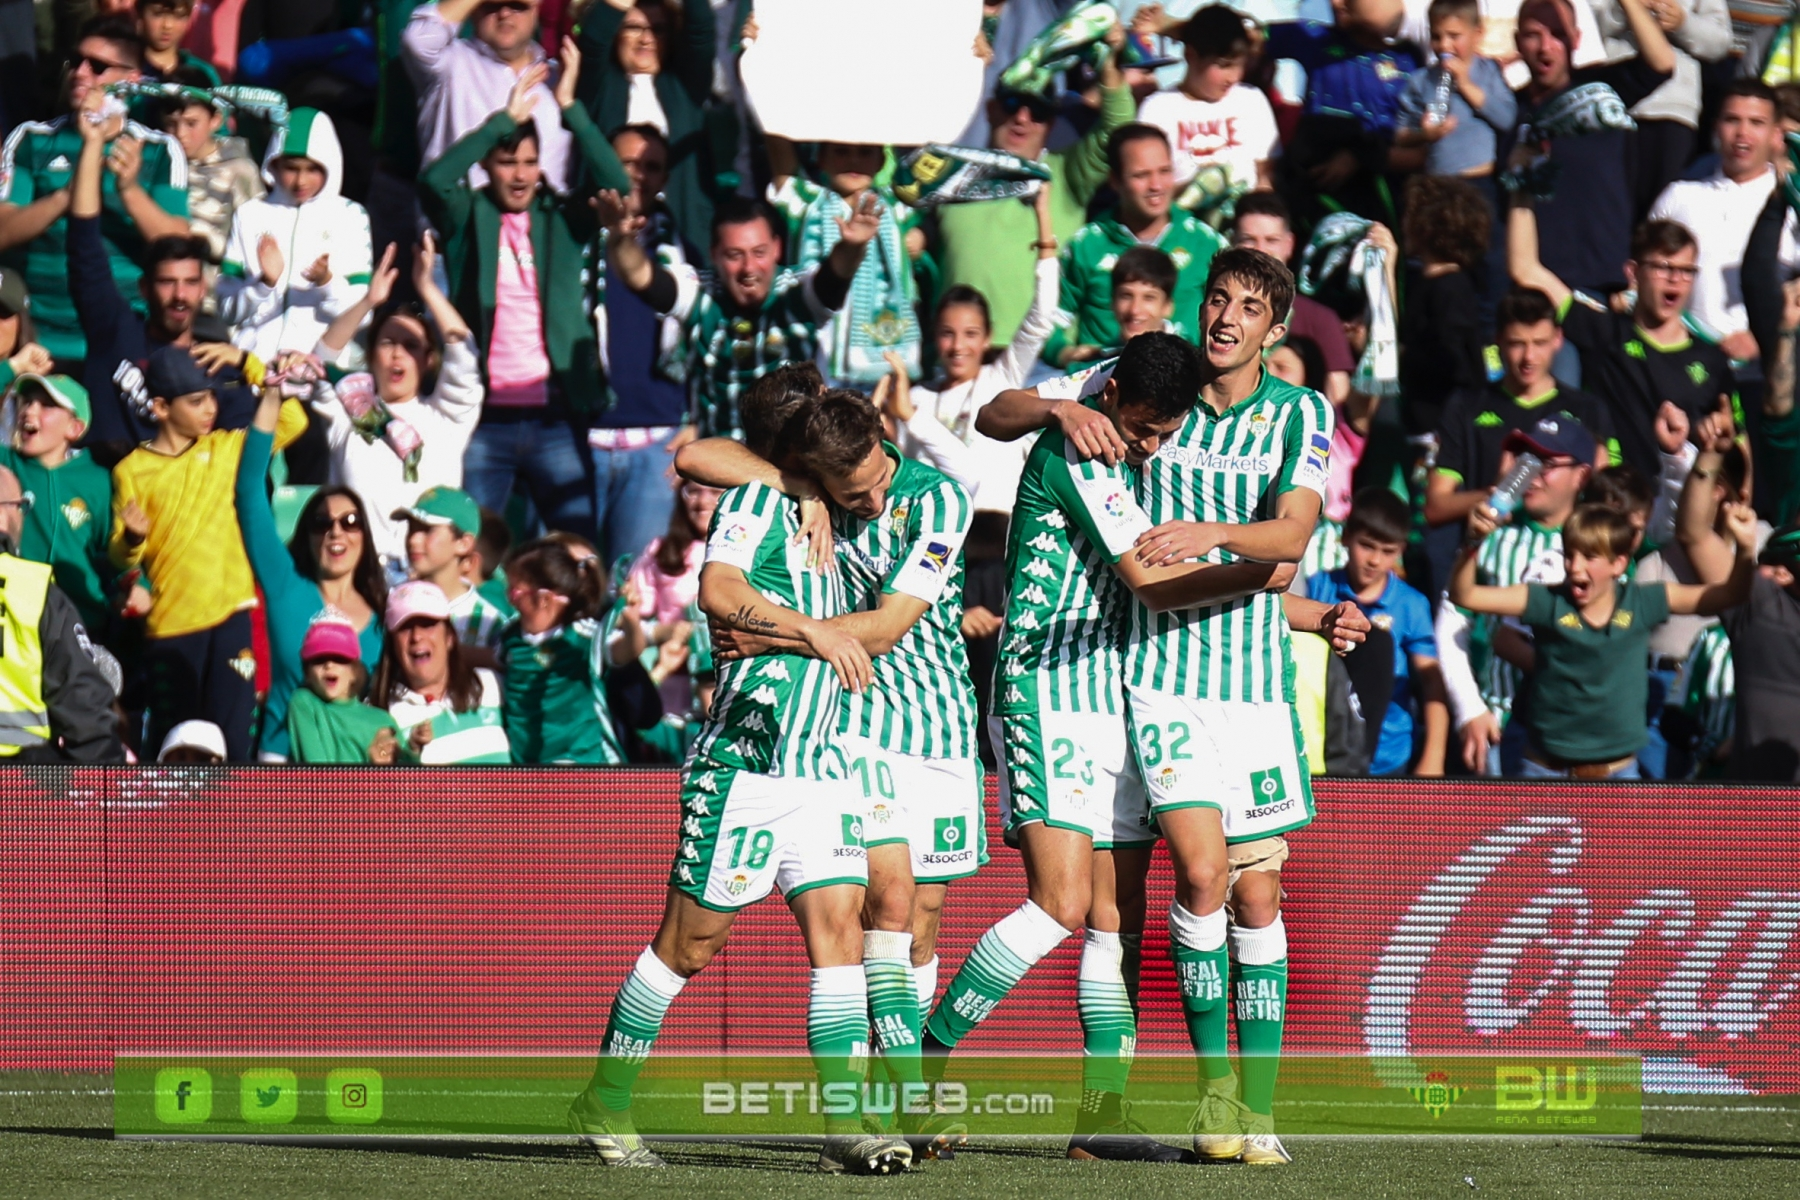 J20 Real Betis - Real Sociedad 48